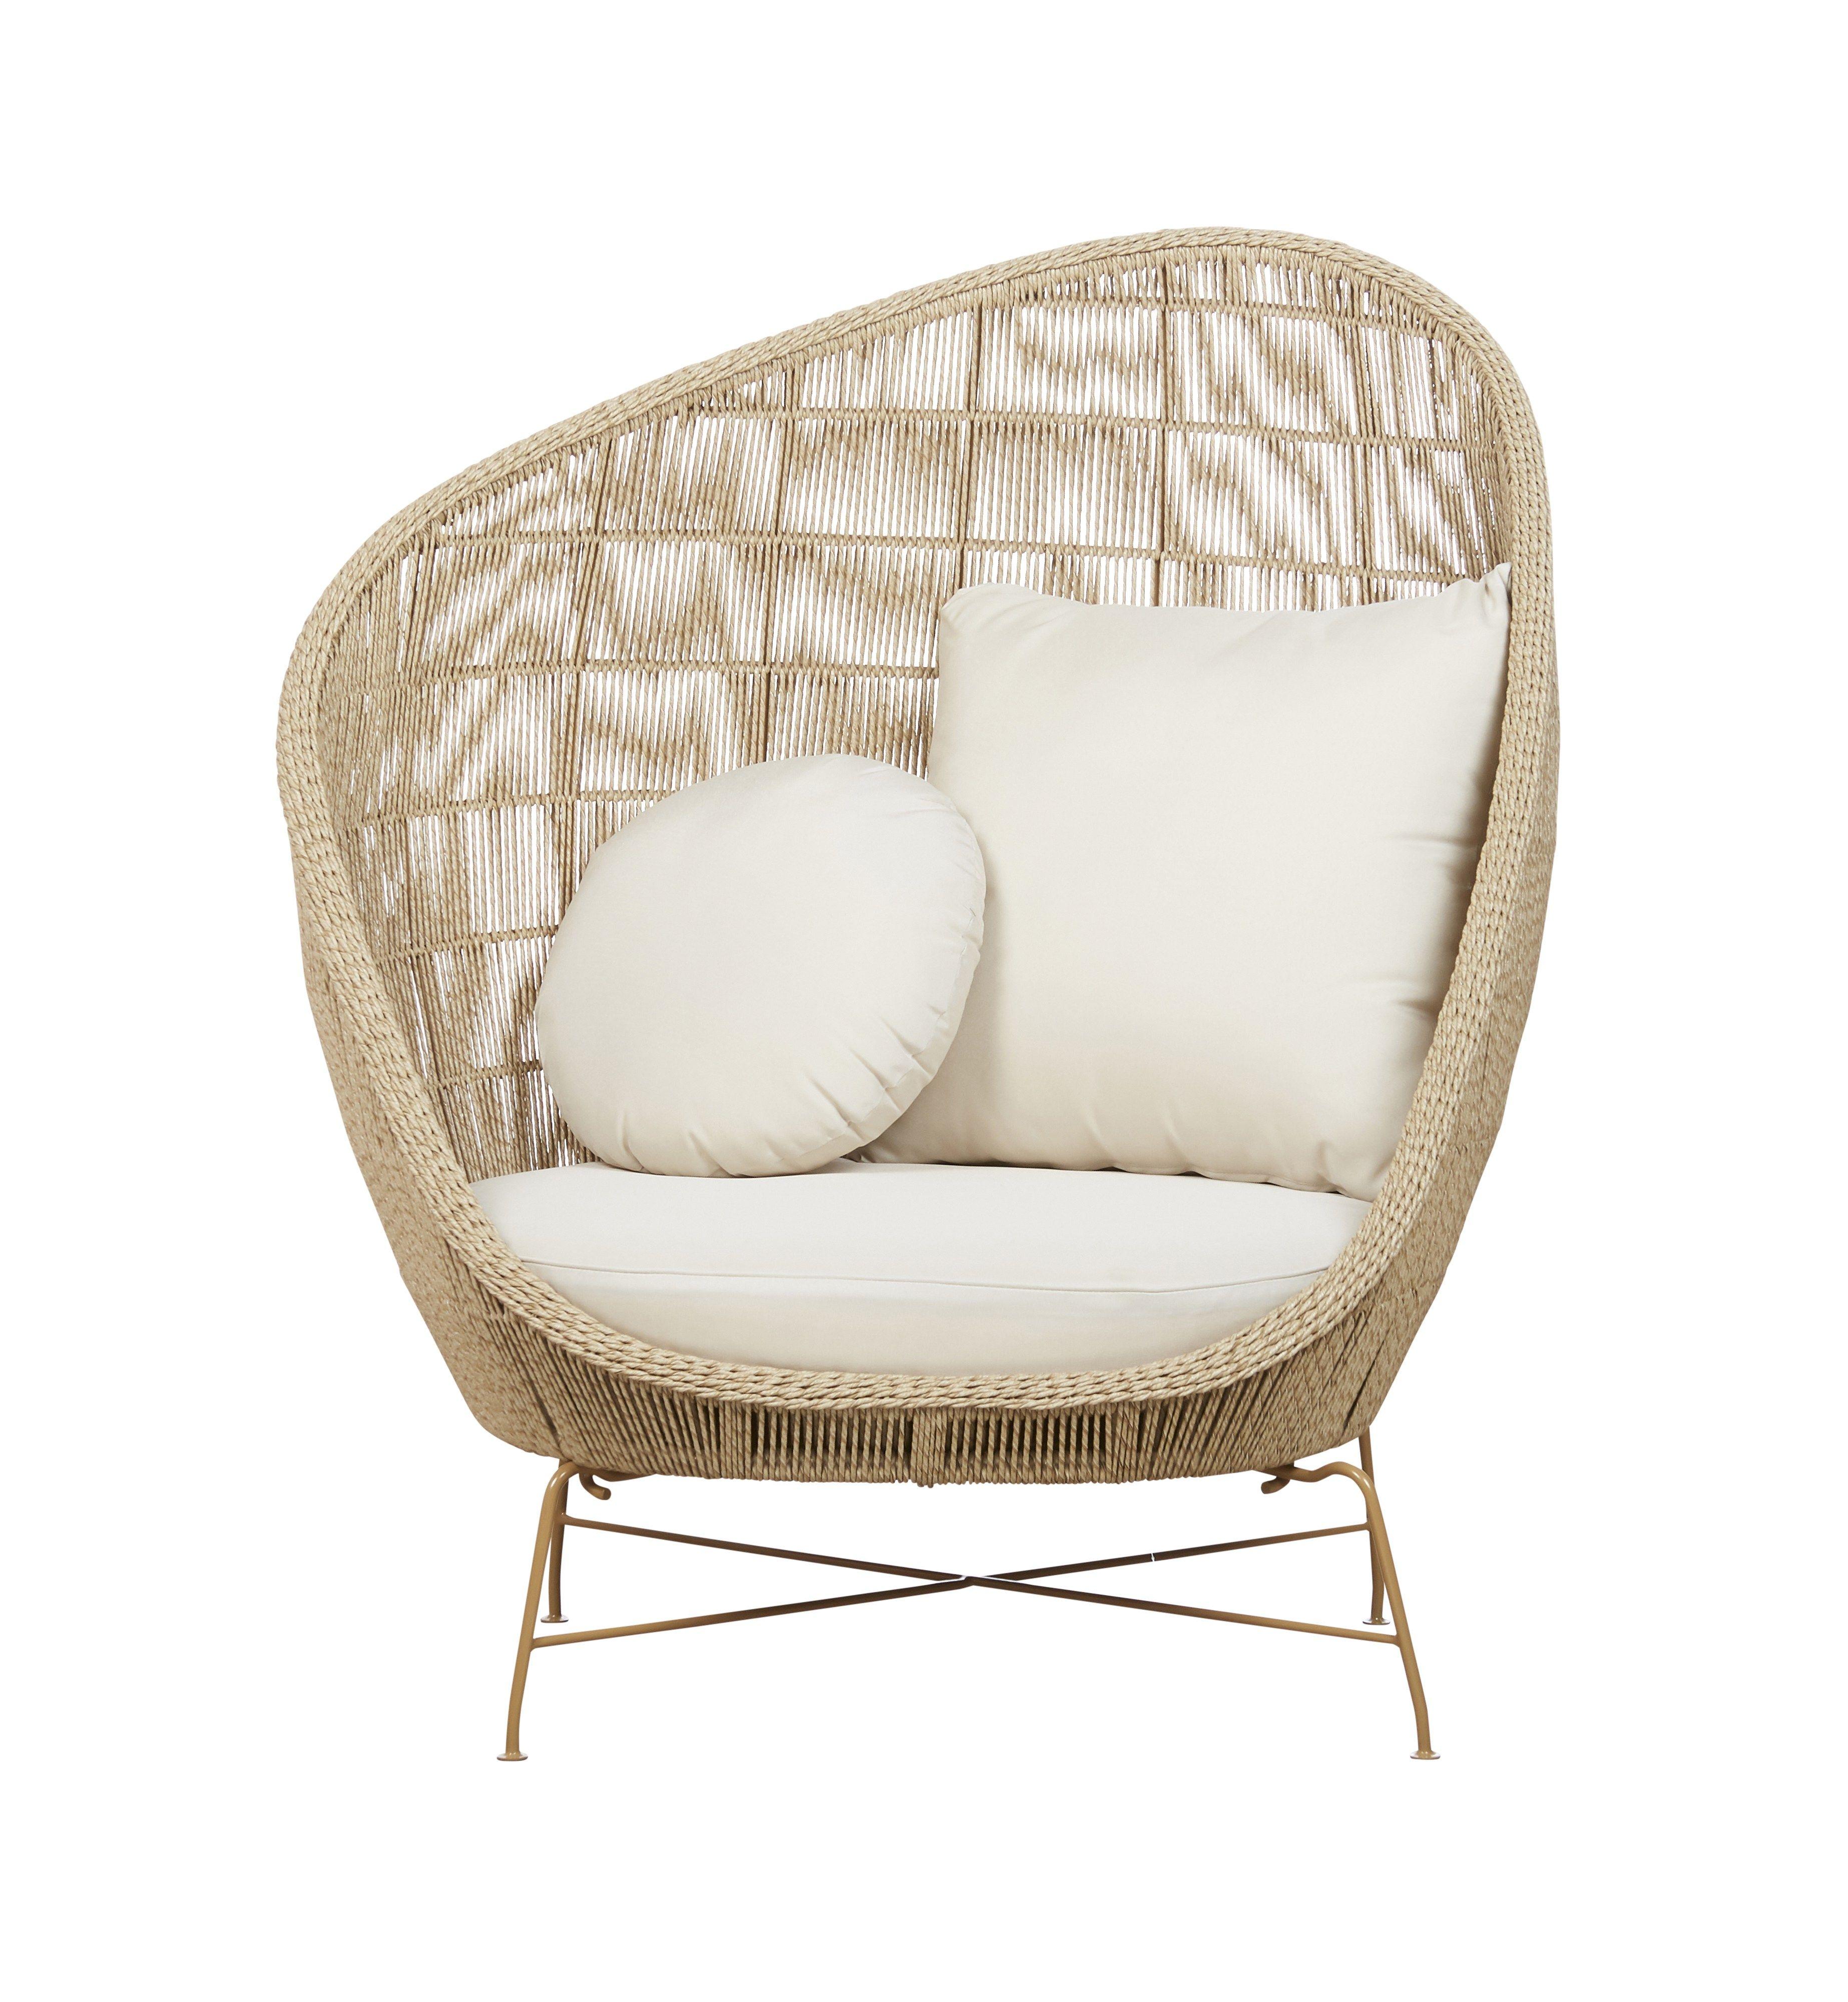 Strange Fenton Fenton Release The Island Collection Outdoor Ibusinesslaw Wood Chair Design Ideas Ibusinesslaworg